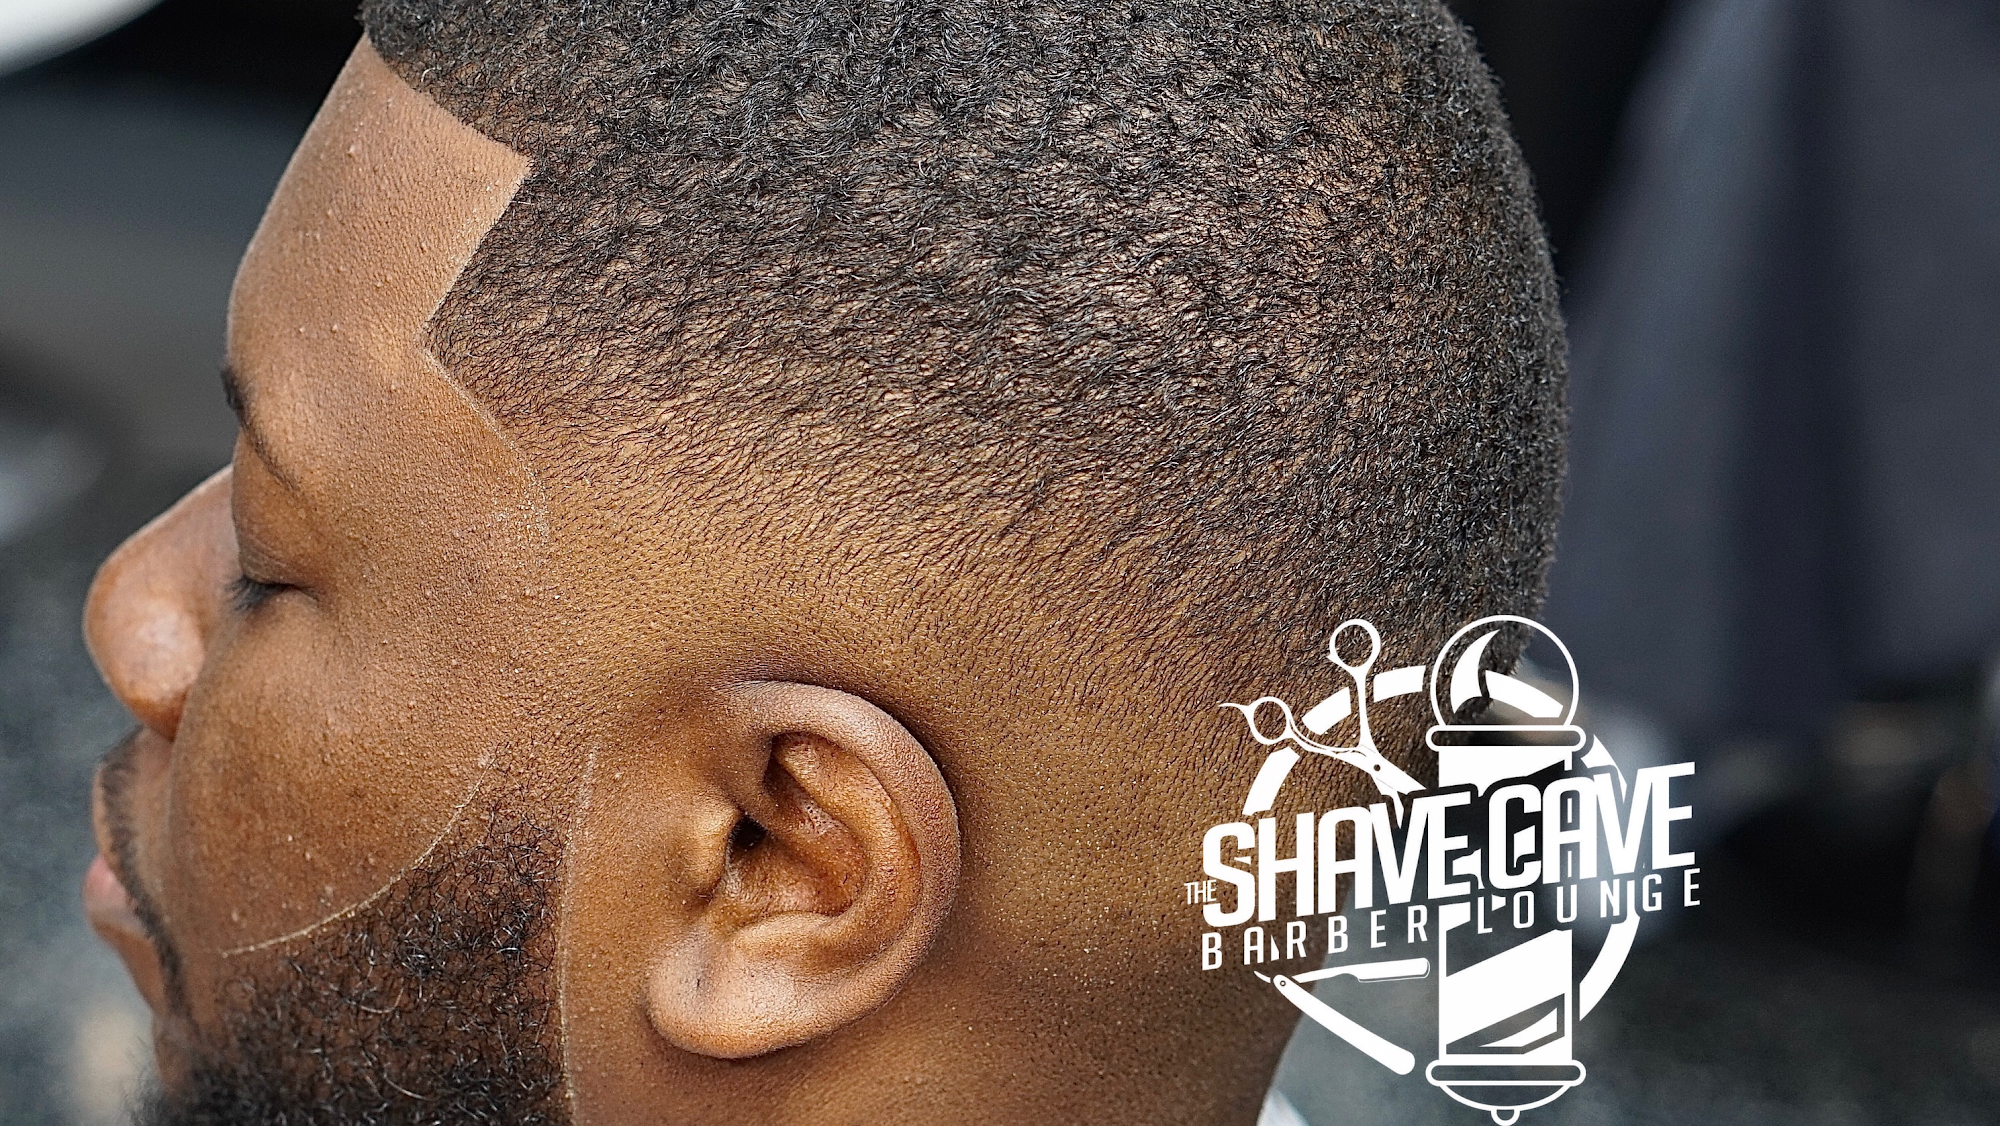 The Shave Cave Barber Lounge 4680 Brownsboro Rd C, Winston-Salem